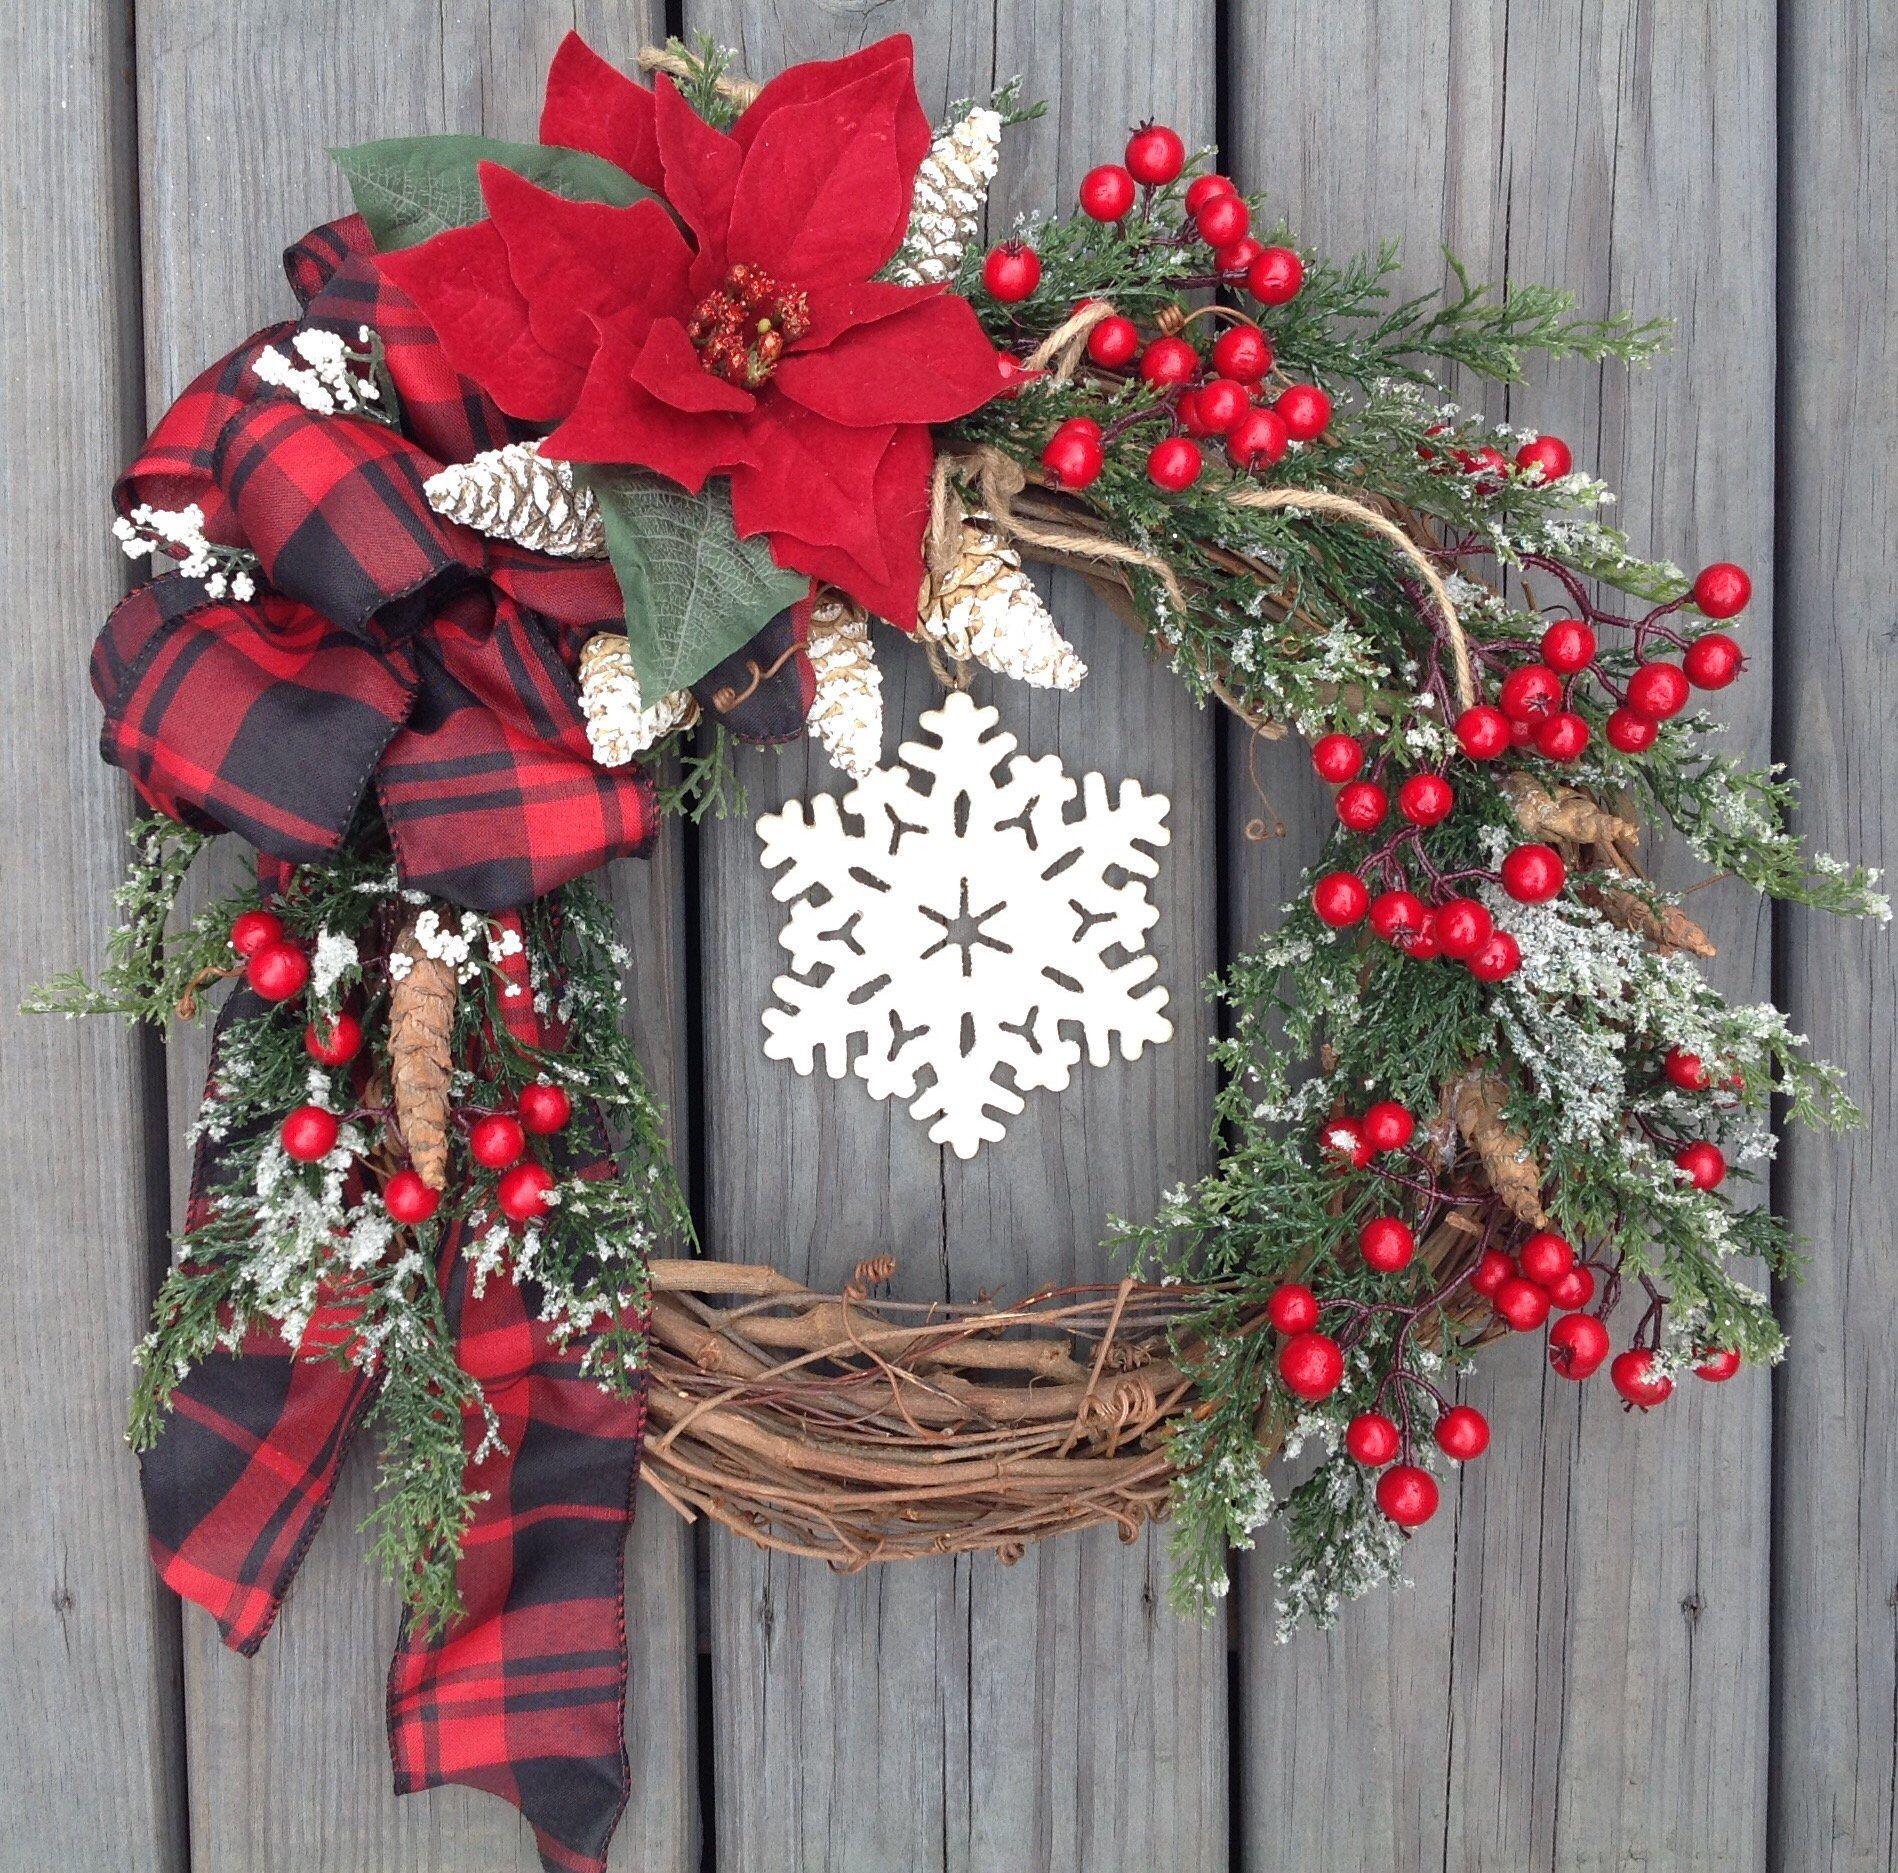 Christmas wreath holiday wreath front door wreath